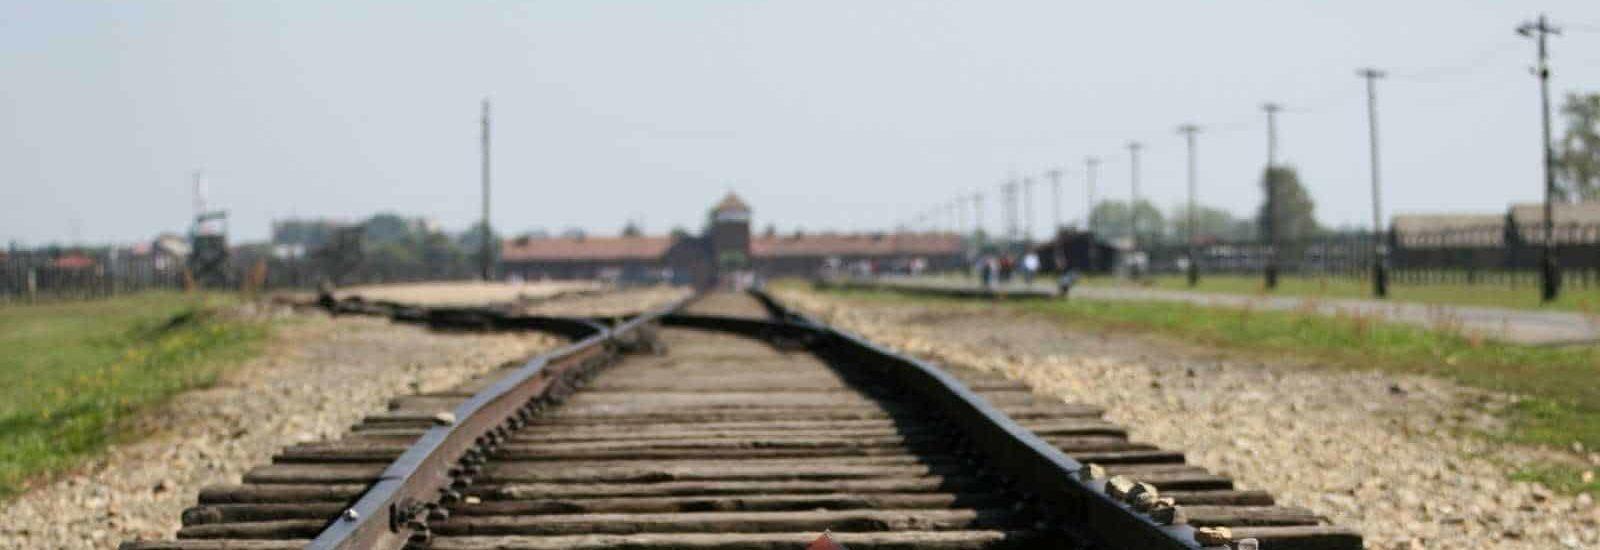 Gate to Birkenau during Krakow Auschwitz tour